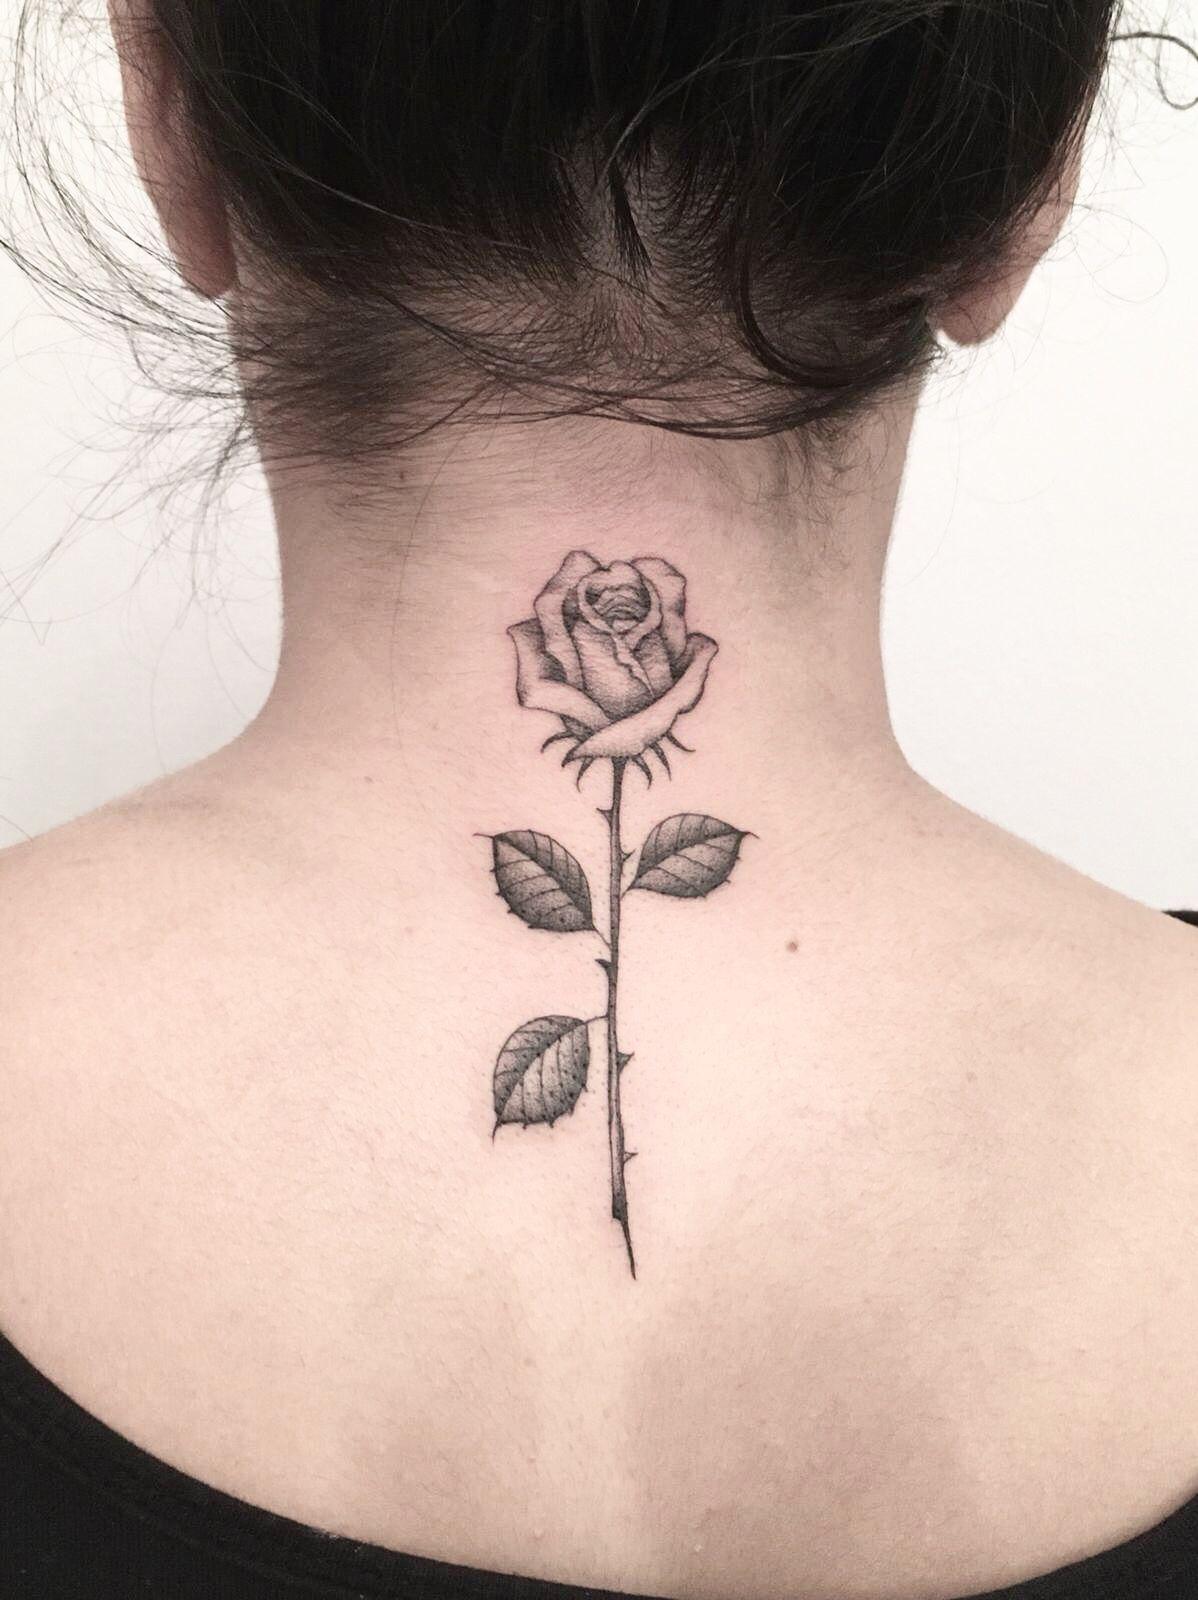 Rose Tattoo Rose Neck Tattoo Neck Tattoo Back Of Neck Tattoo